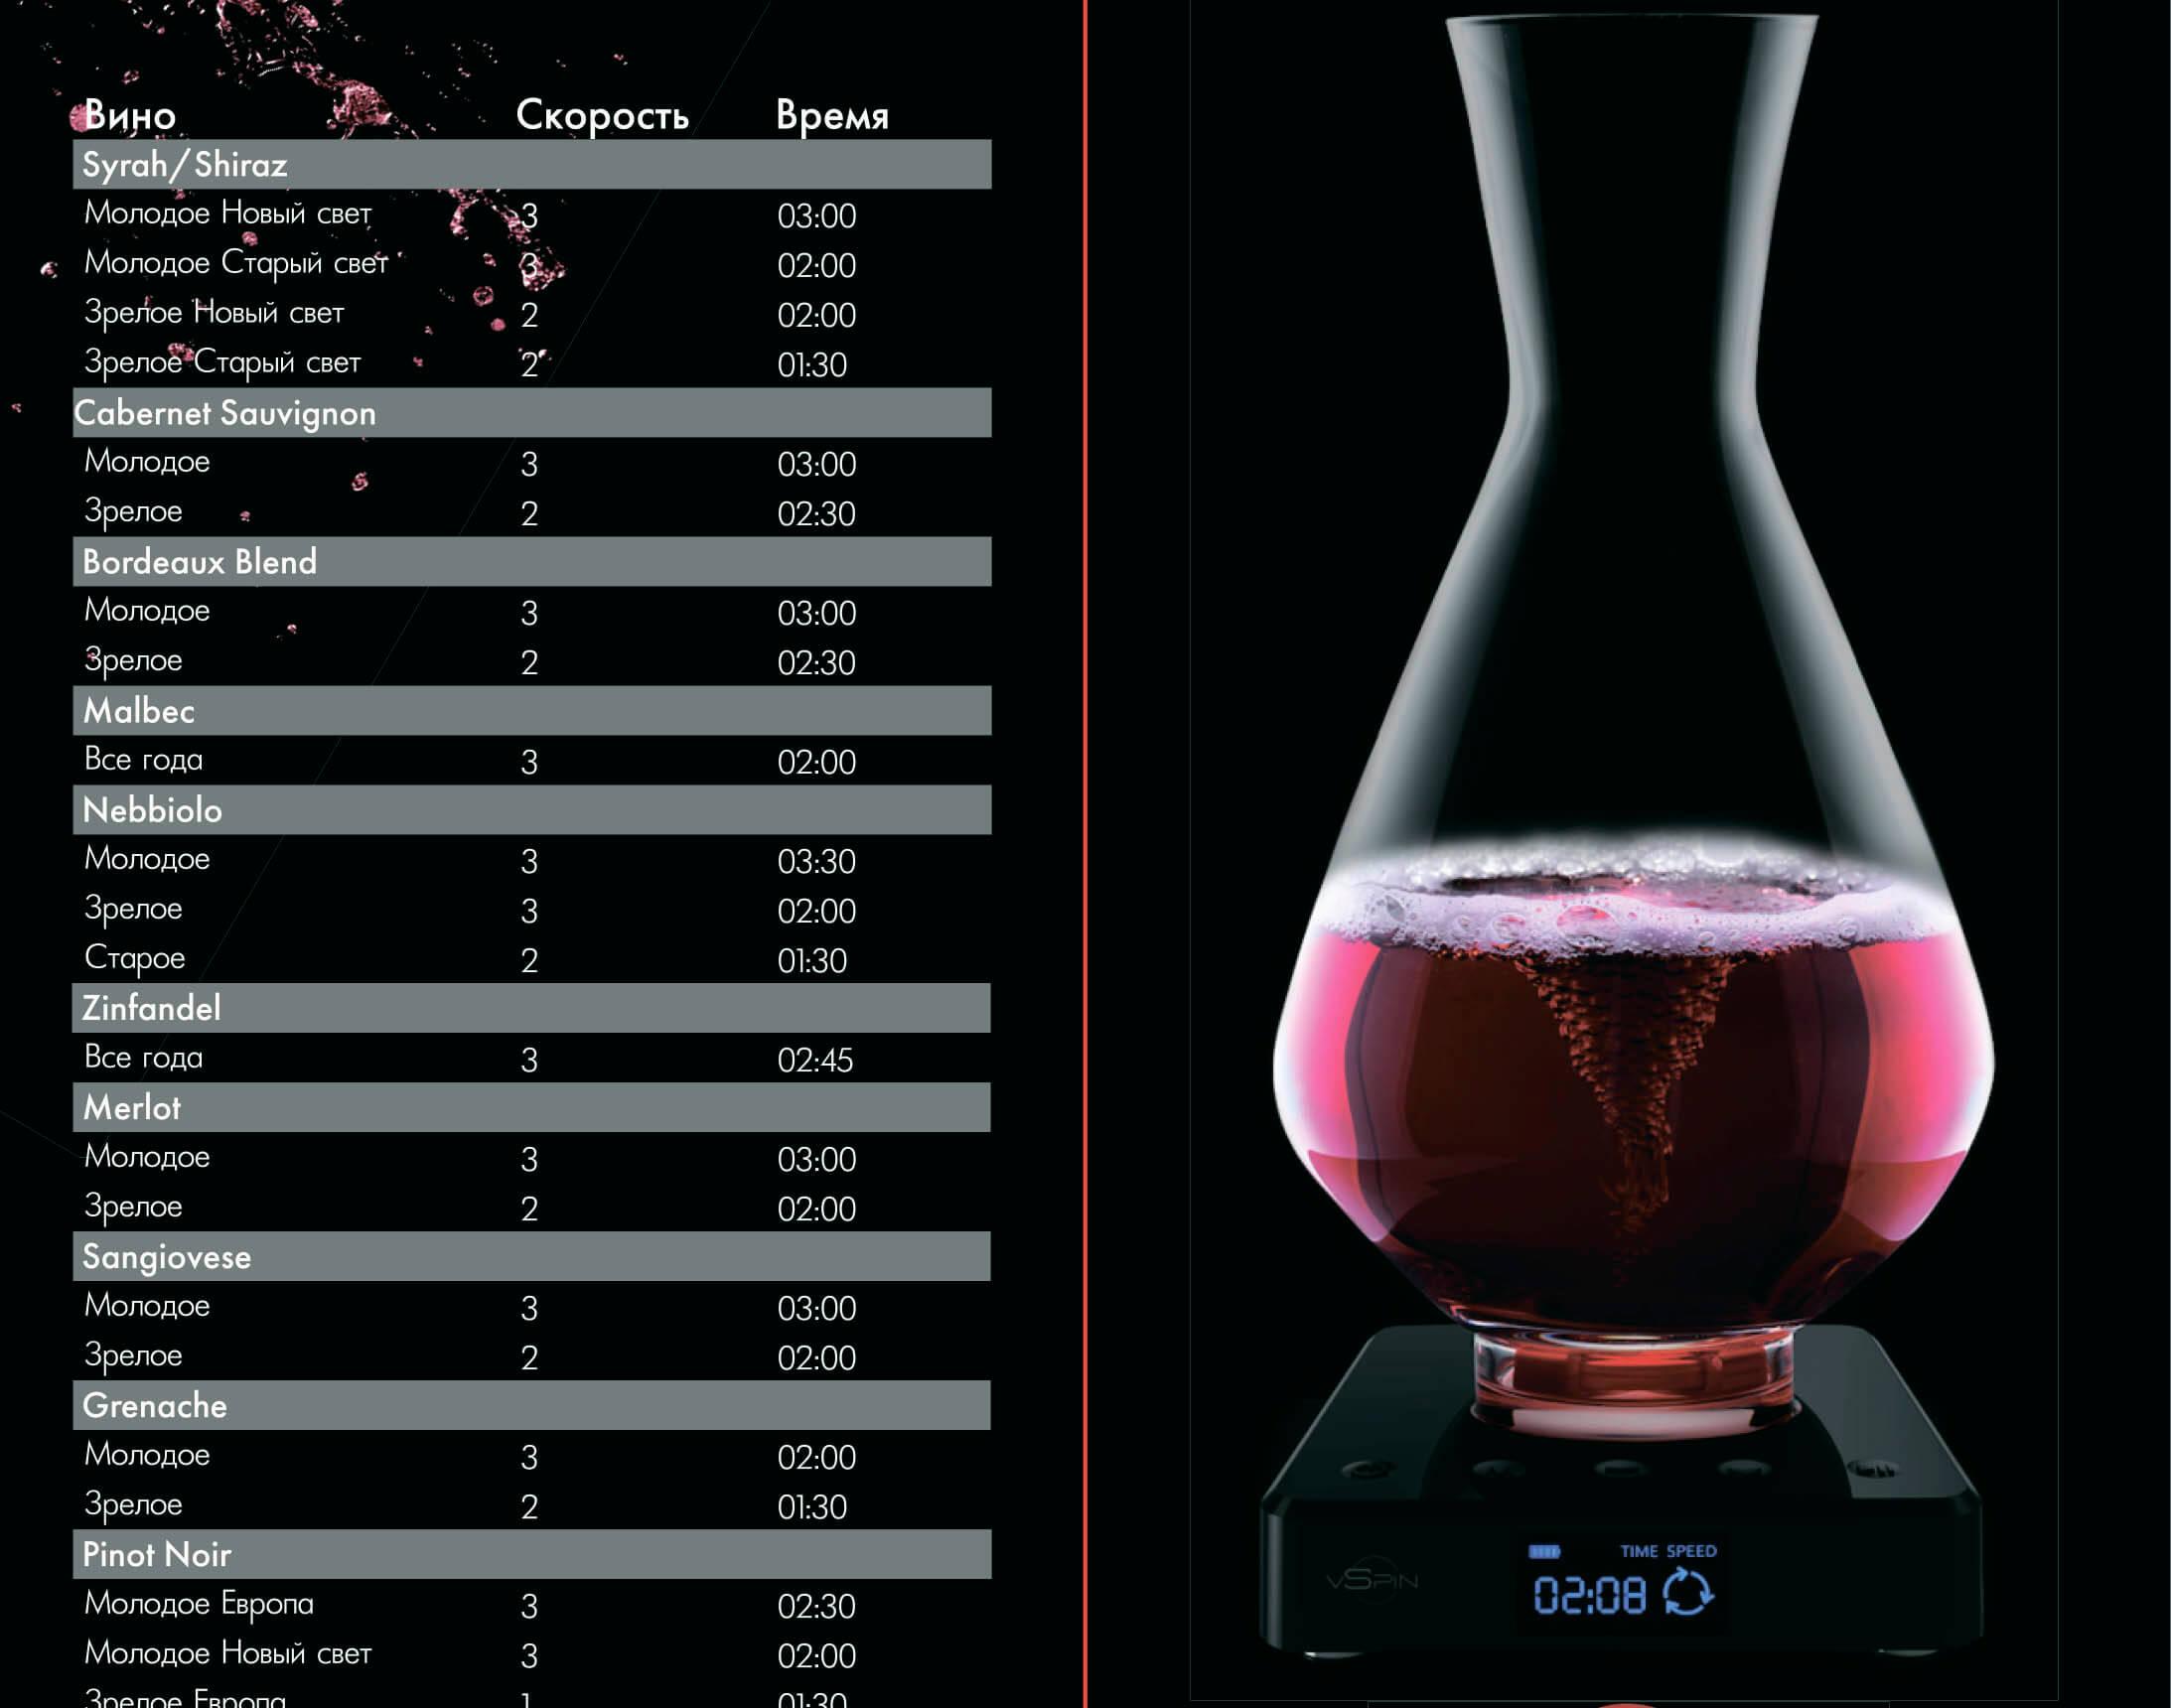 таблица по аэрации вина с помощью vSpin